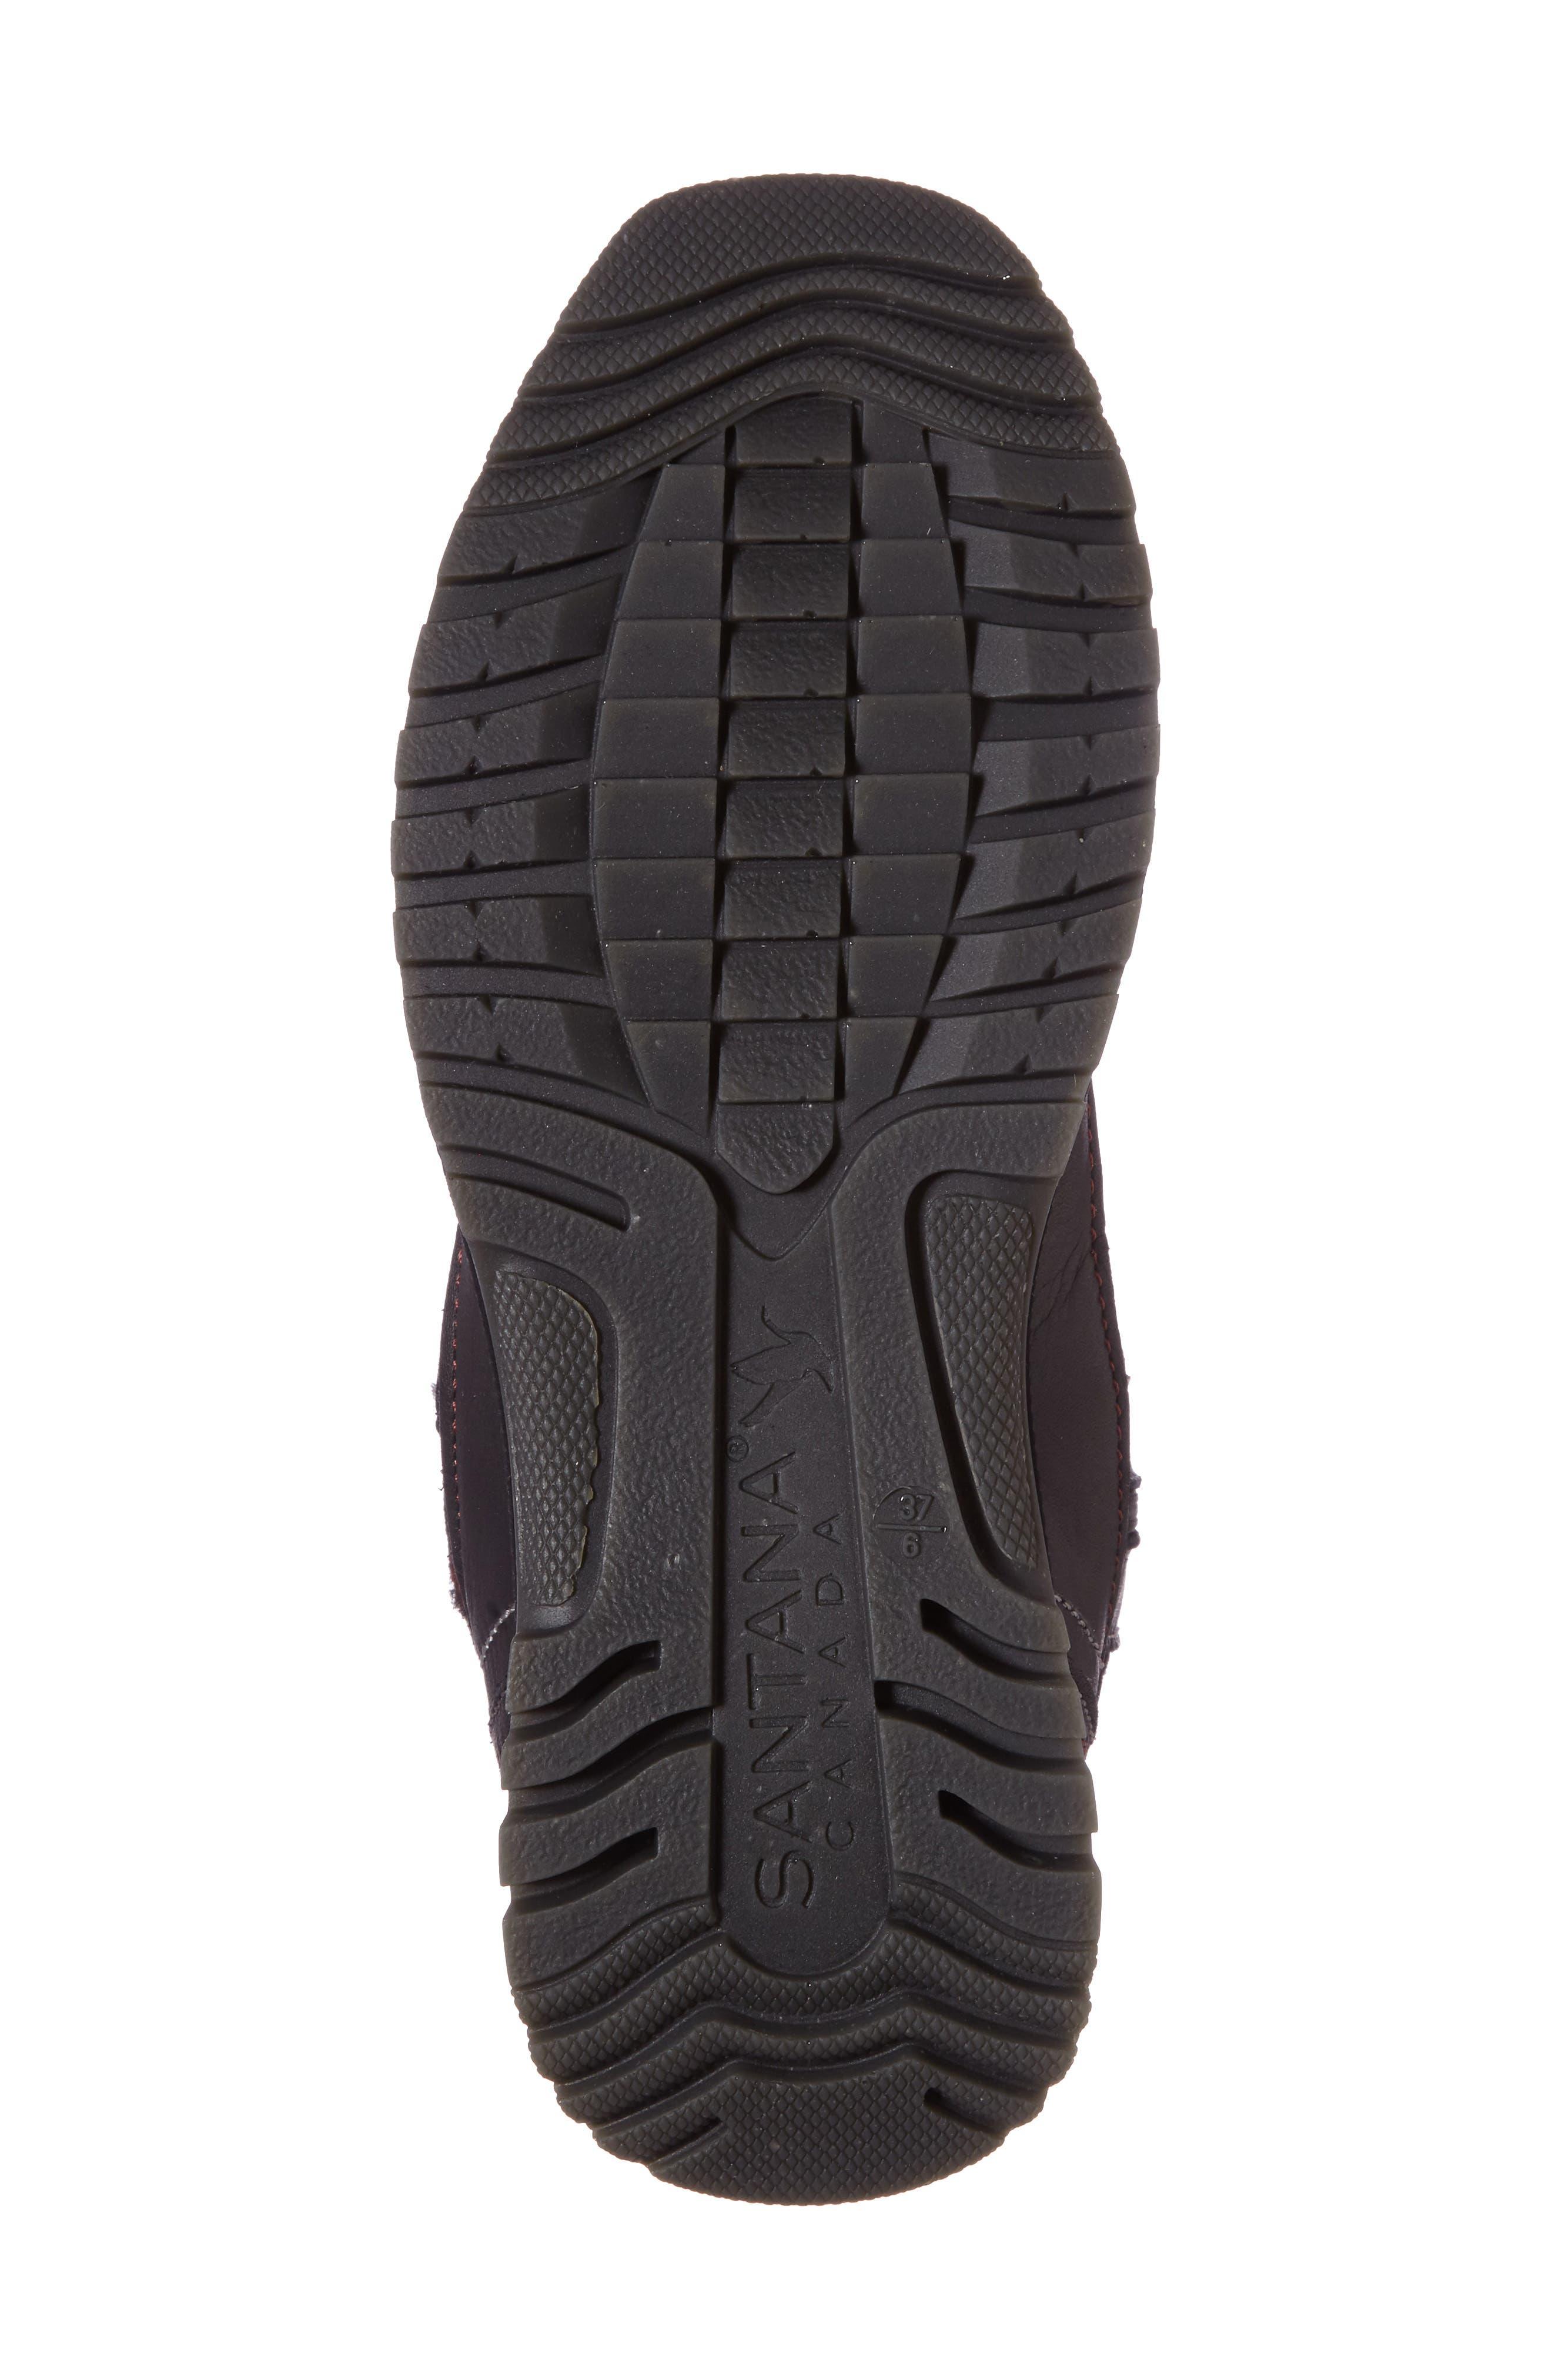 Seraphine Genuine Shearling Waterproof Winter Boot,                             Alternate thumbnail 5, color,                             001